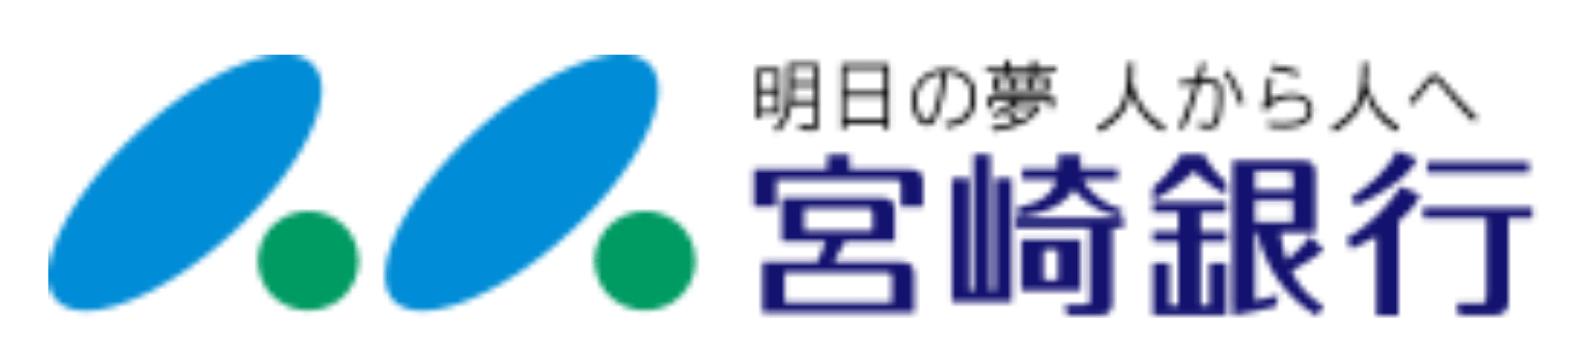 銀行 atm 佐賀